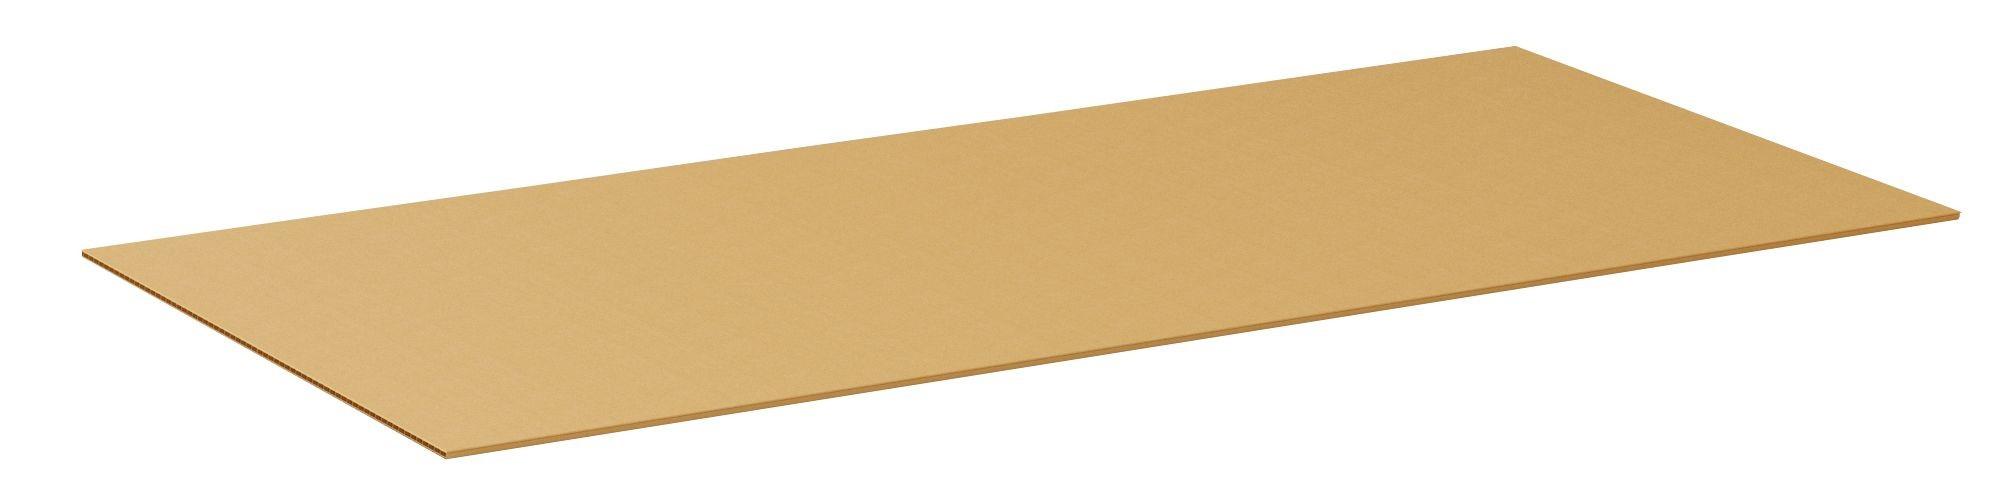 "TOTALPACK® 48 x 96"" Single Wall Corrugated Sheets 10 Units"